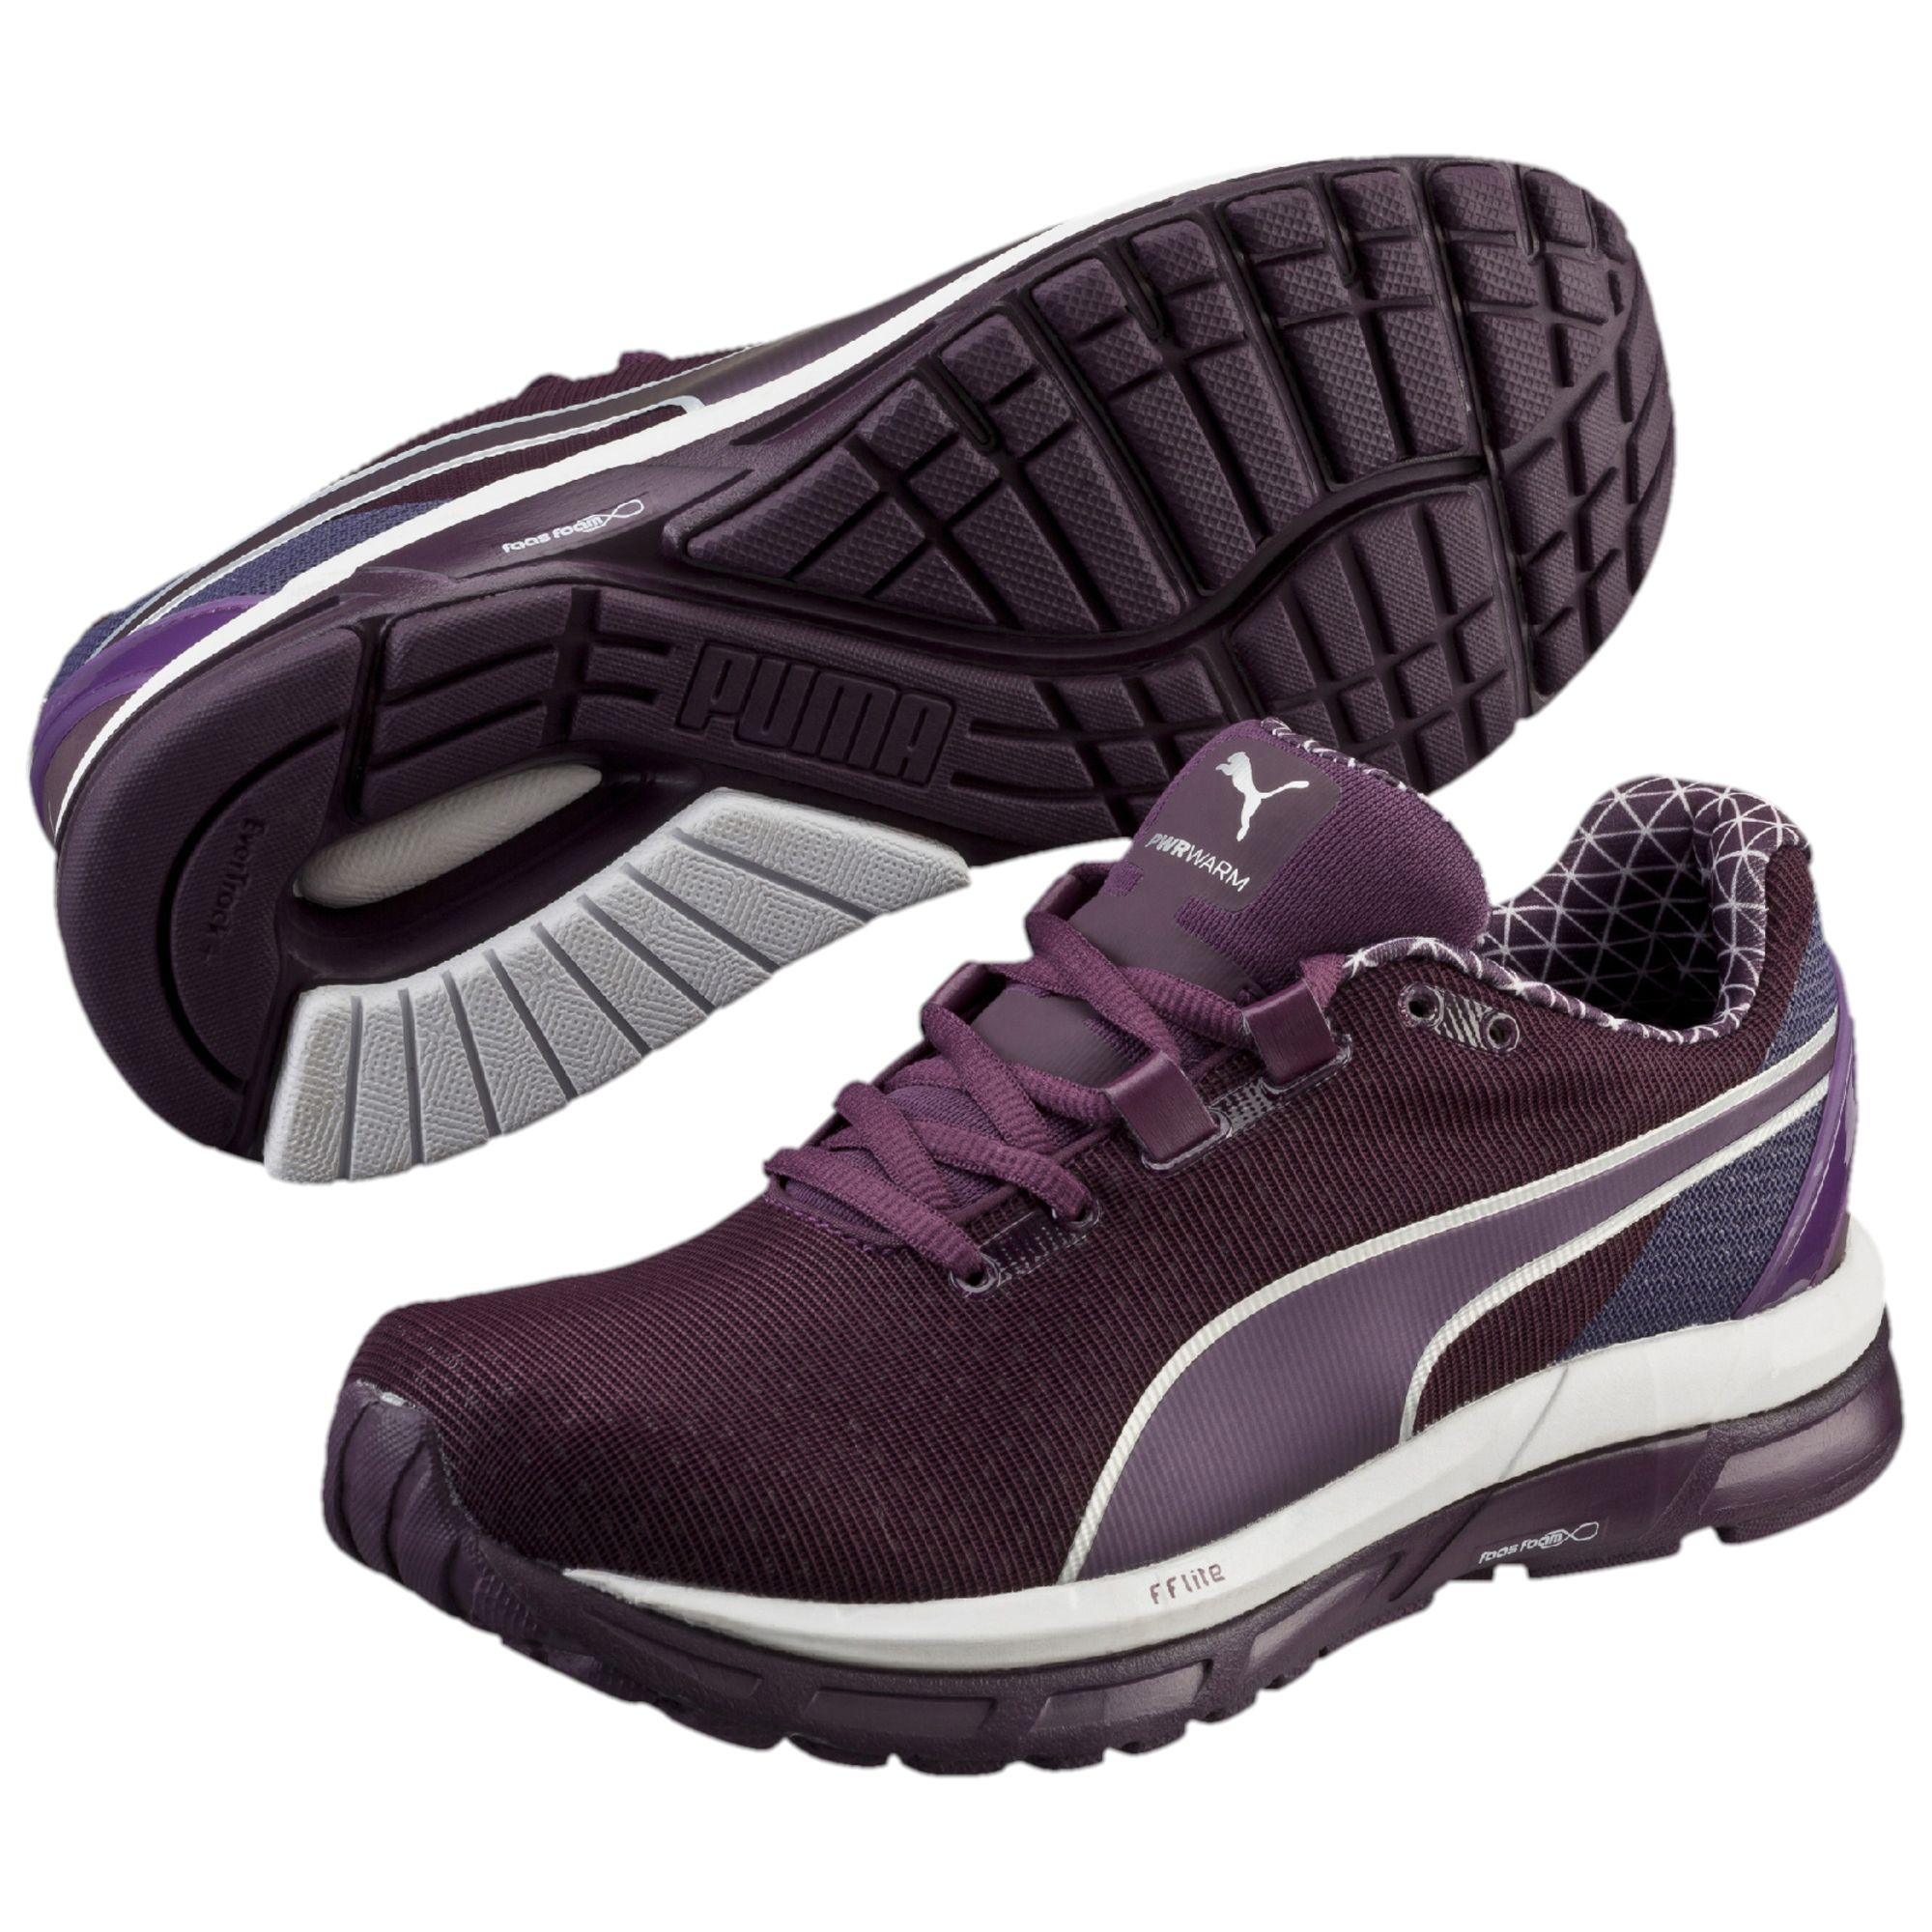 PUMA-FAAS-600-S-v2-PWRWARM-Damen-Laufschuhe-Schuhe-Stabilitaet-Frauen